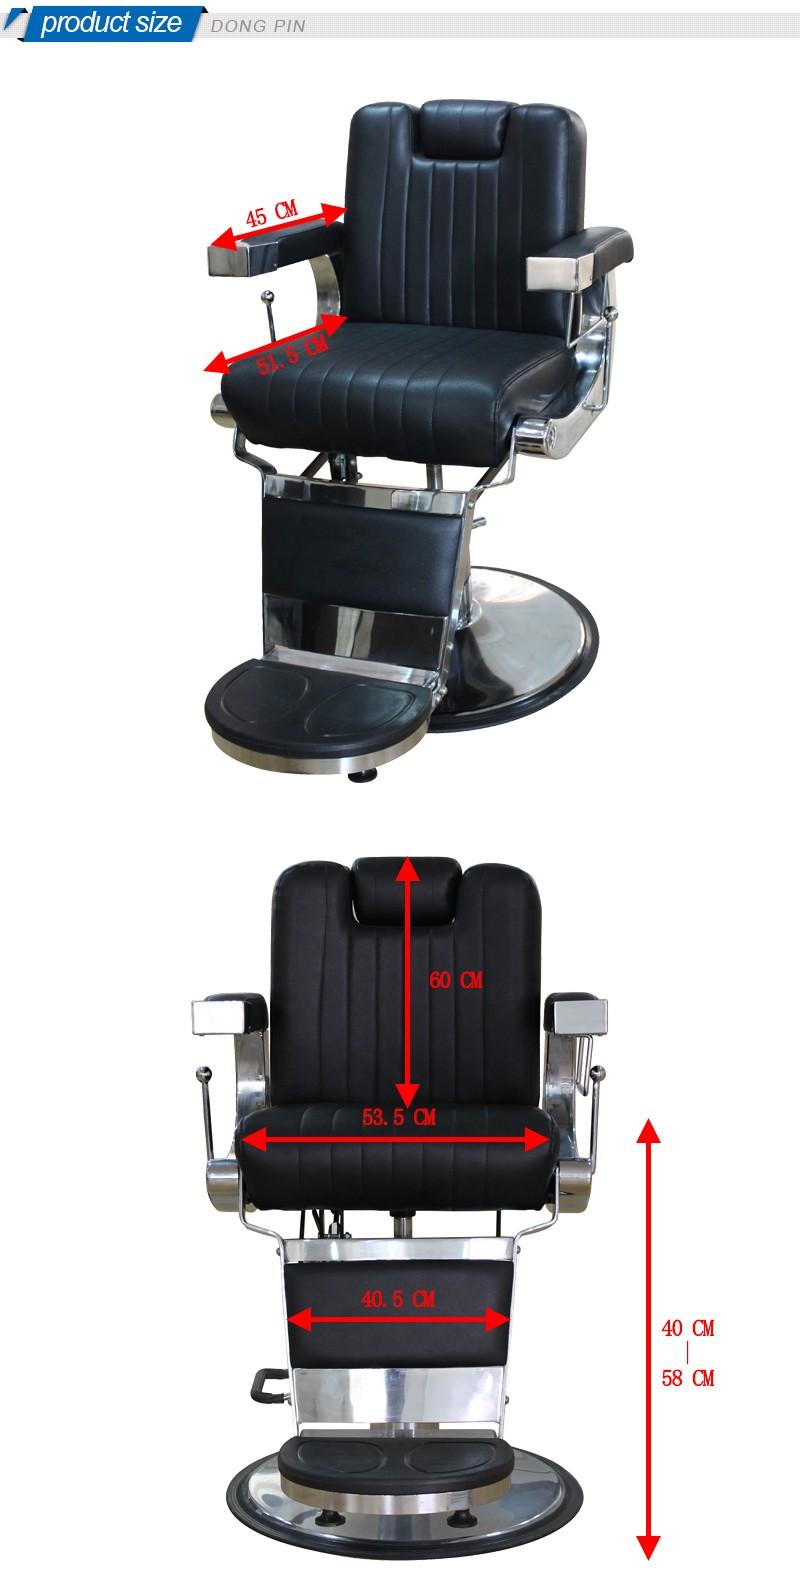 salon equipment heavy duty barber chair ebay cheap barber chair - Salon Equipment Heavy Duty Barber Chair Ebay Cheap Barber Chair